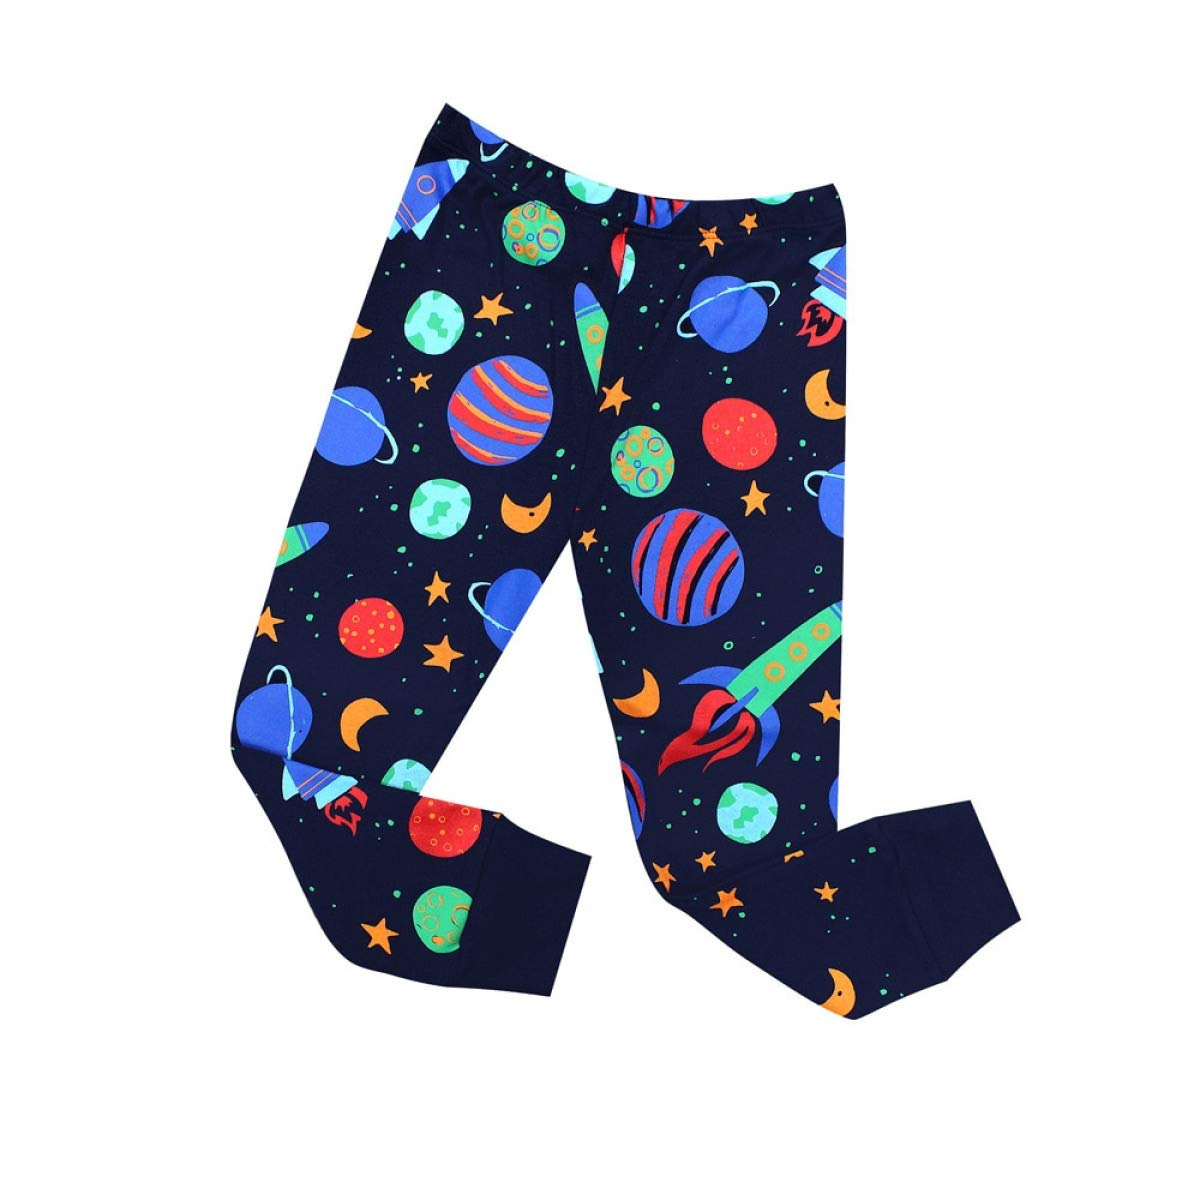 Myhome99 Pajamas Children Sleepwear Rocket Pijamas for 1-8 Years Girls Boys